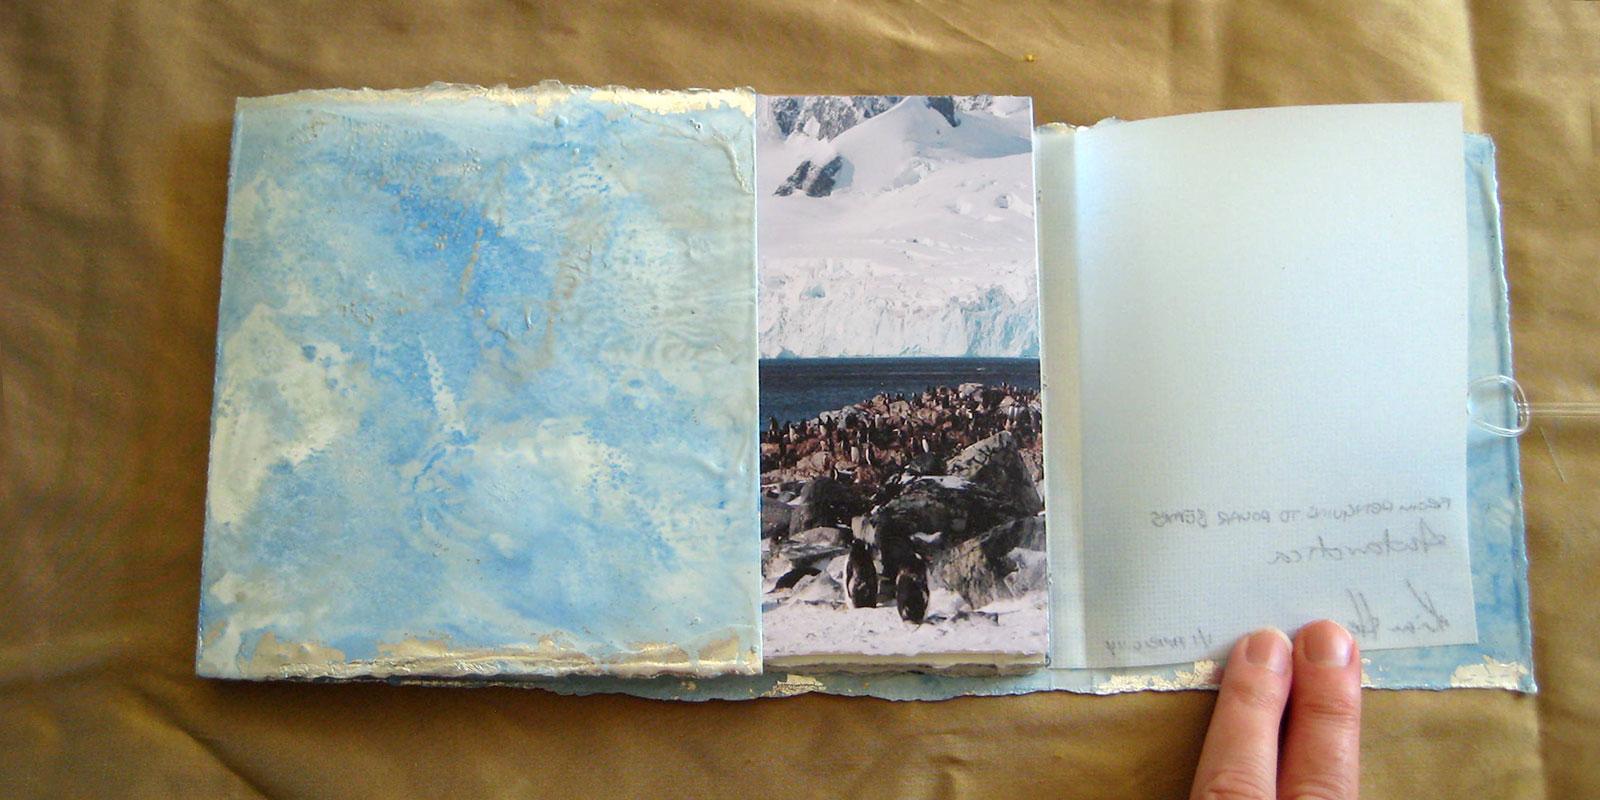 From Penguins to Polar Bears - Antarctica